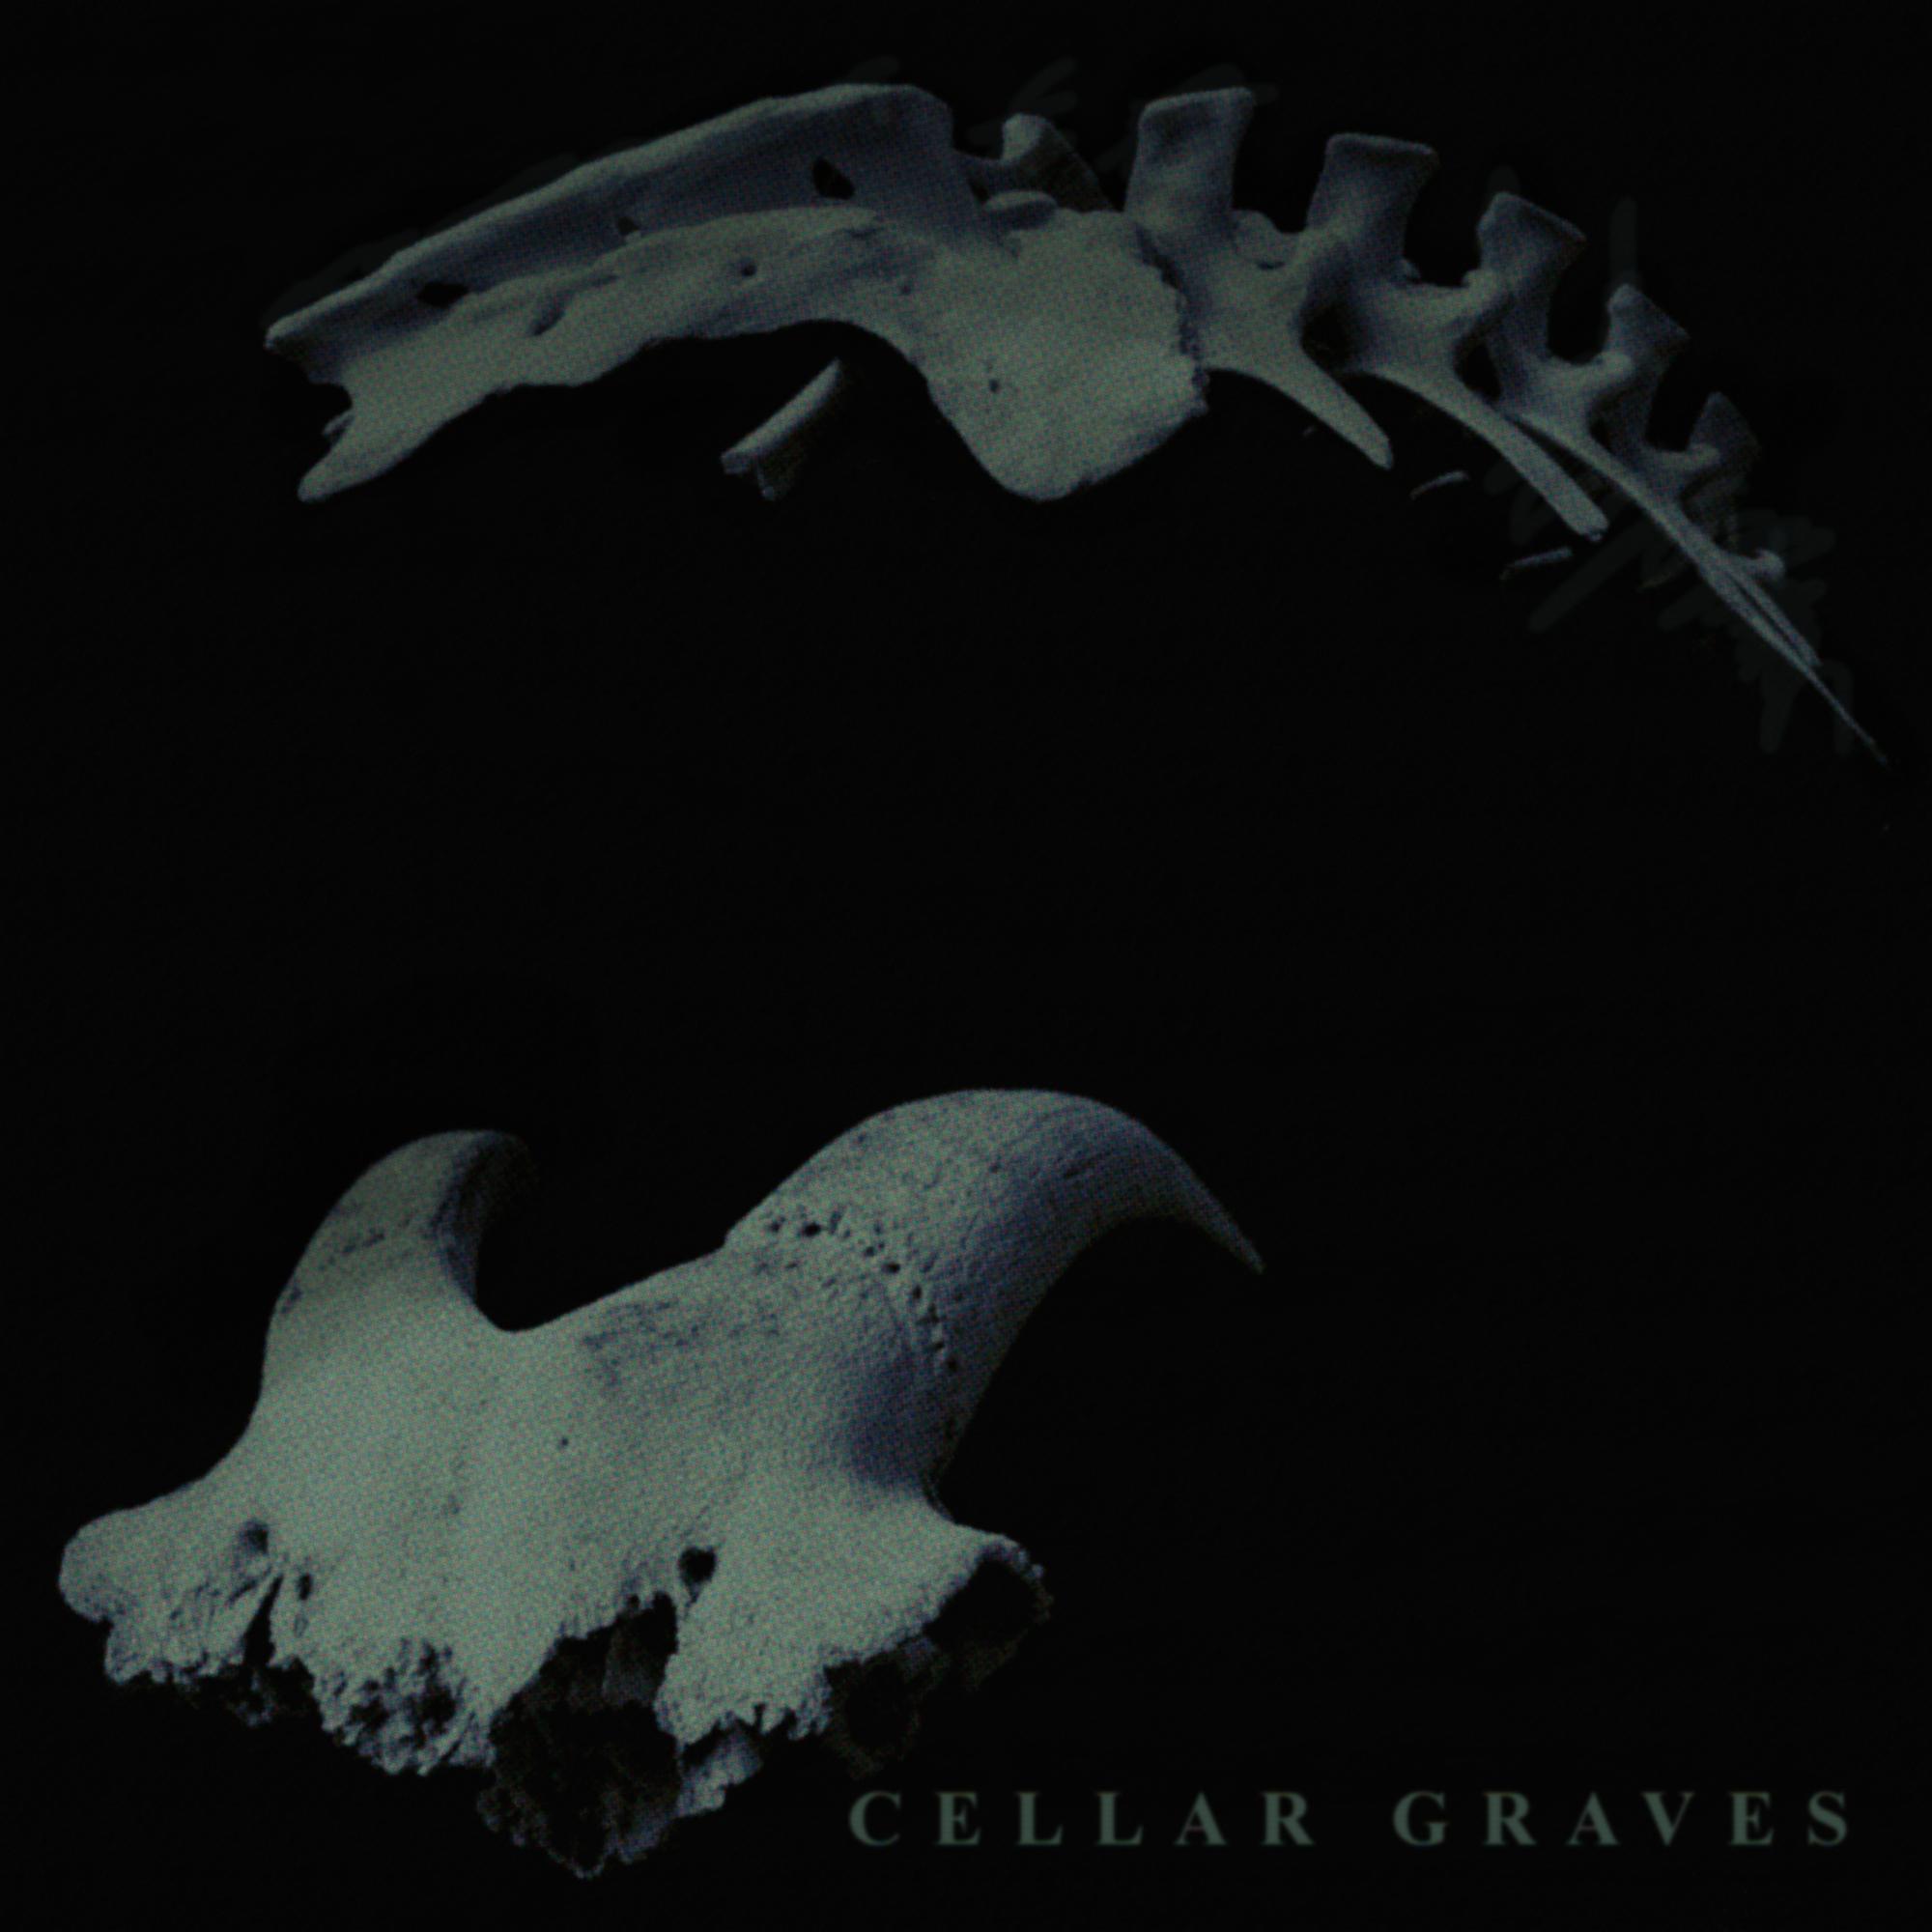 Observer: Cellar Graves & Razorback Hollow